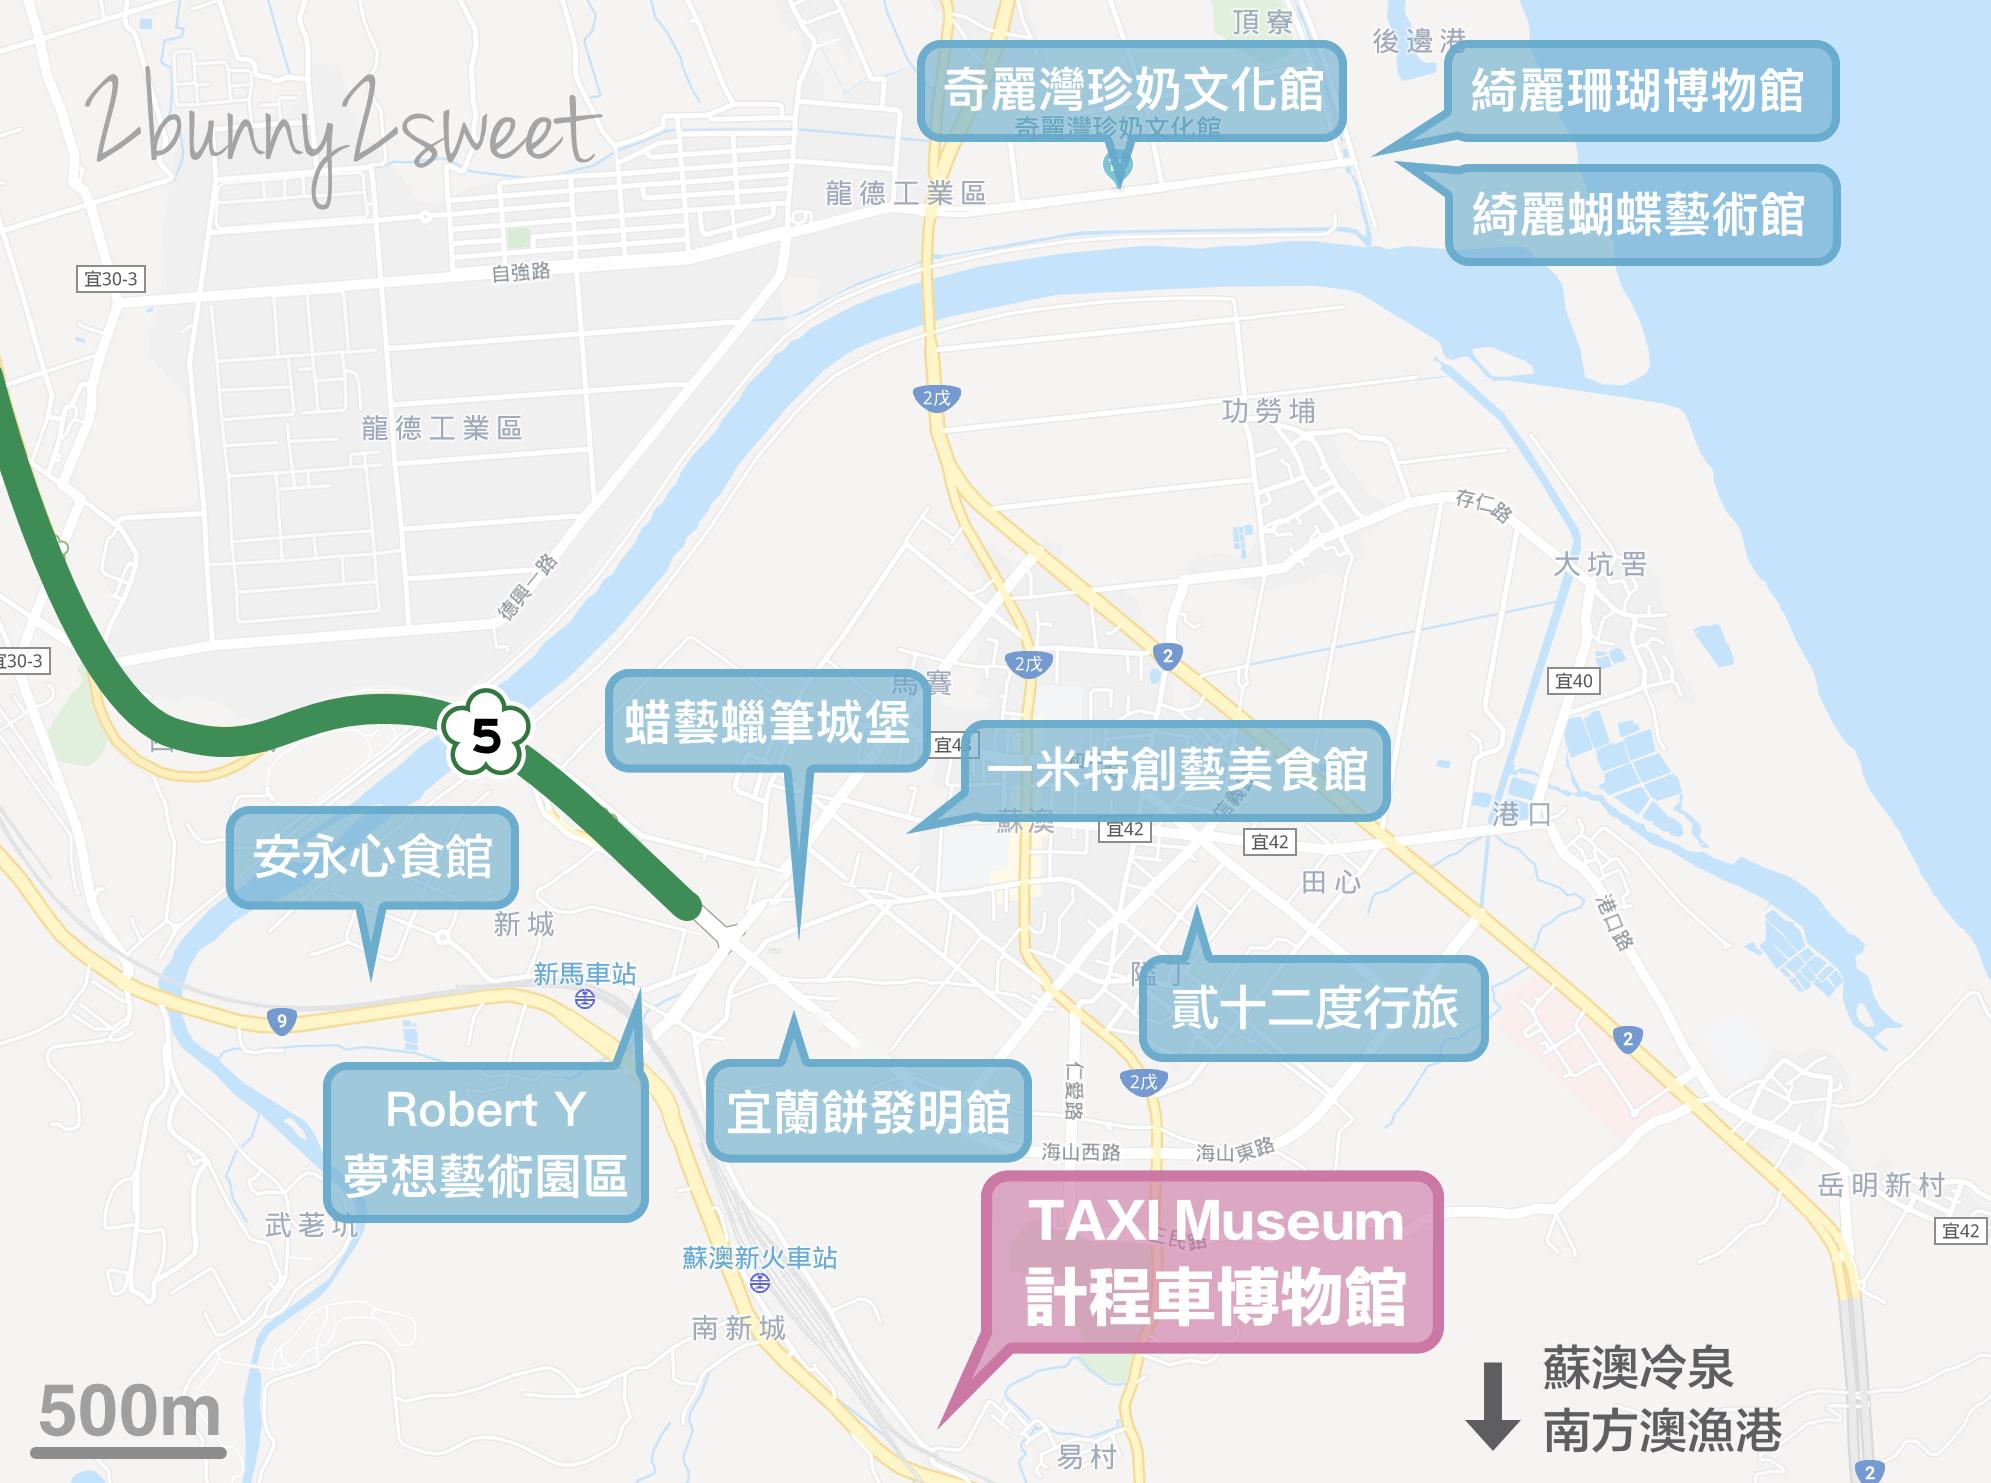 2019-1123-TZXI Muesum 計程車博物館-39